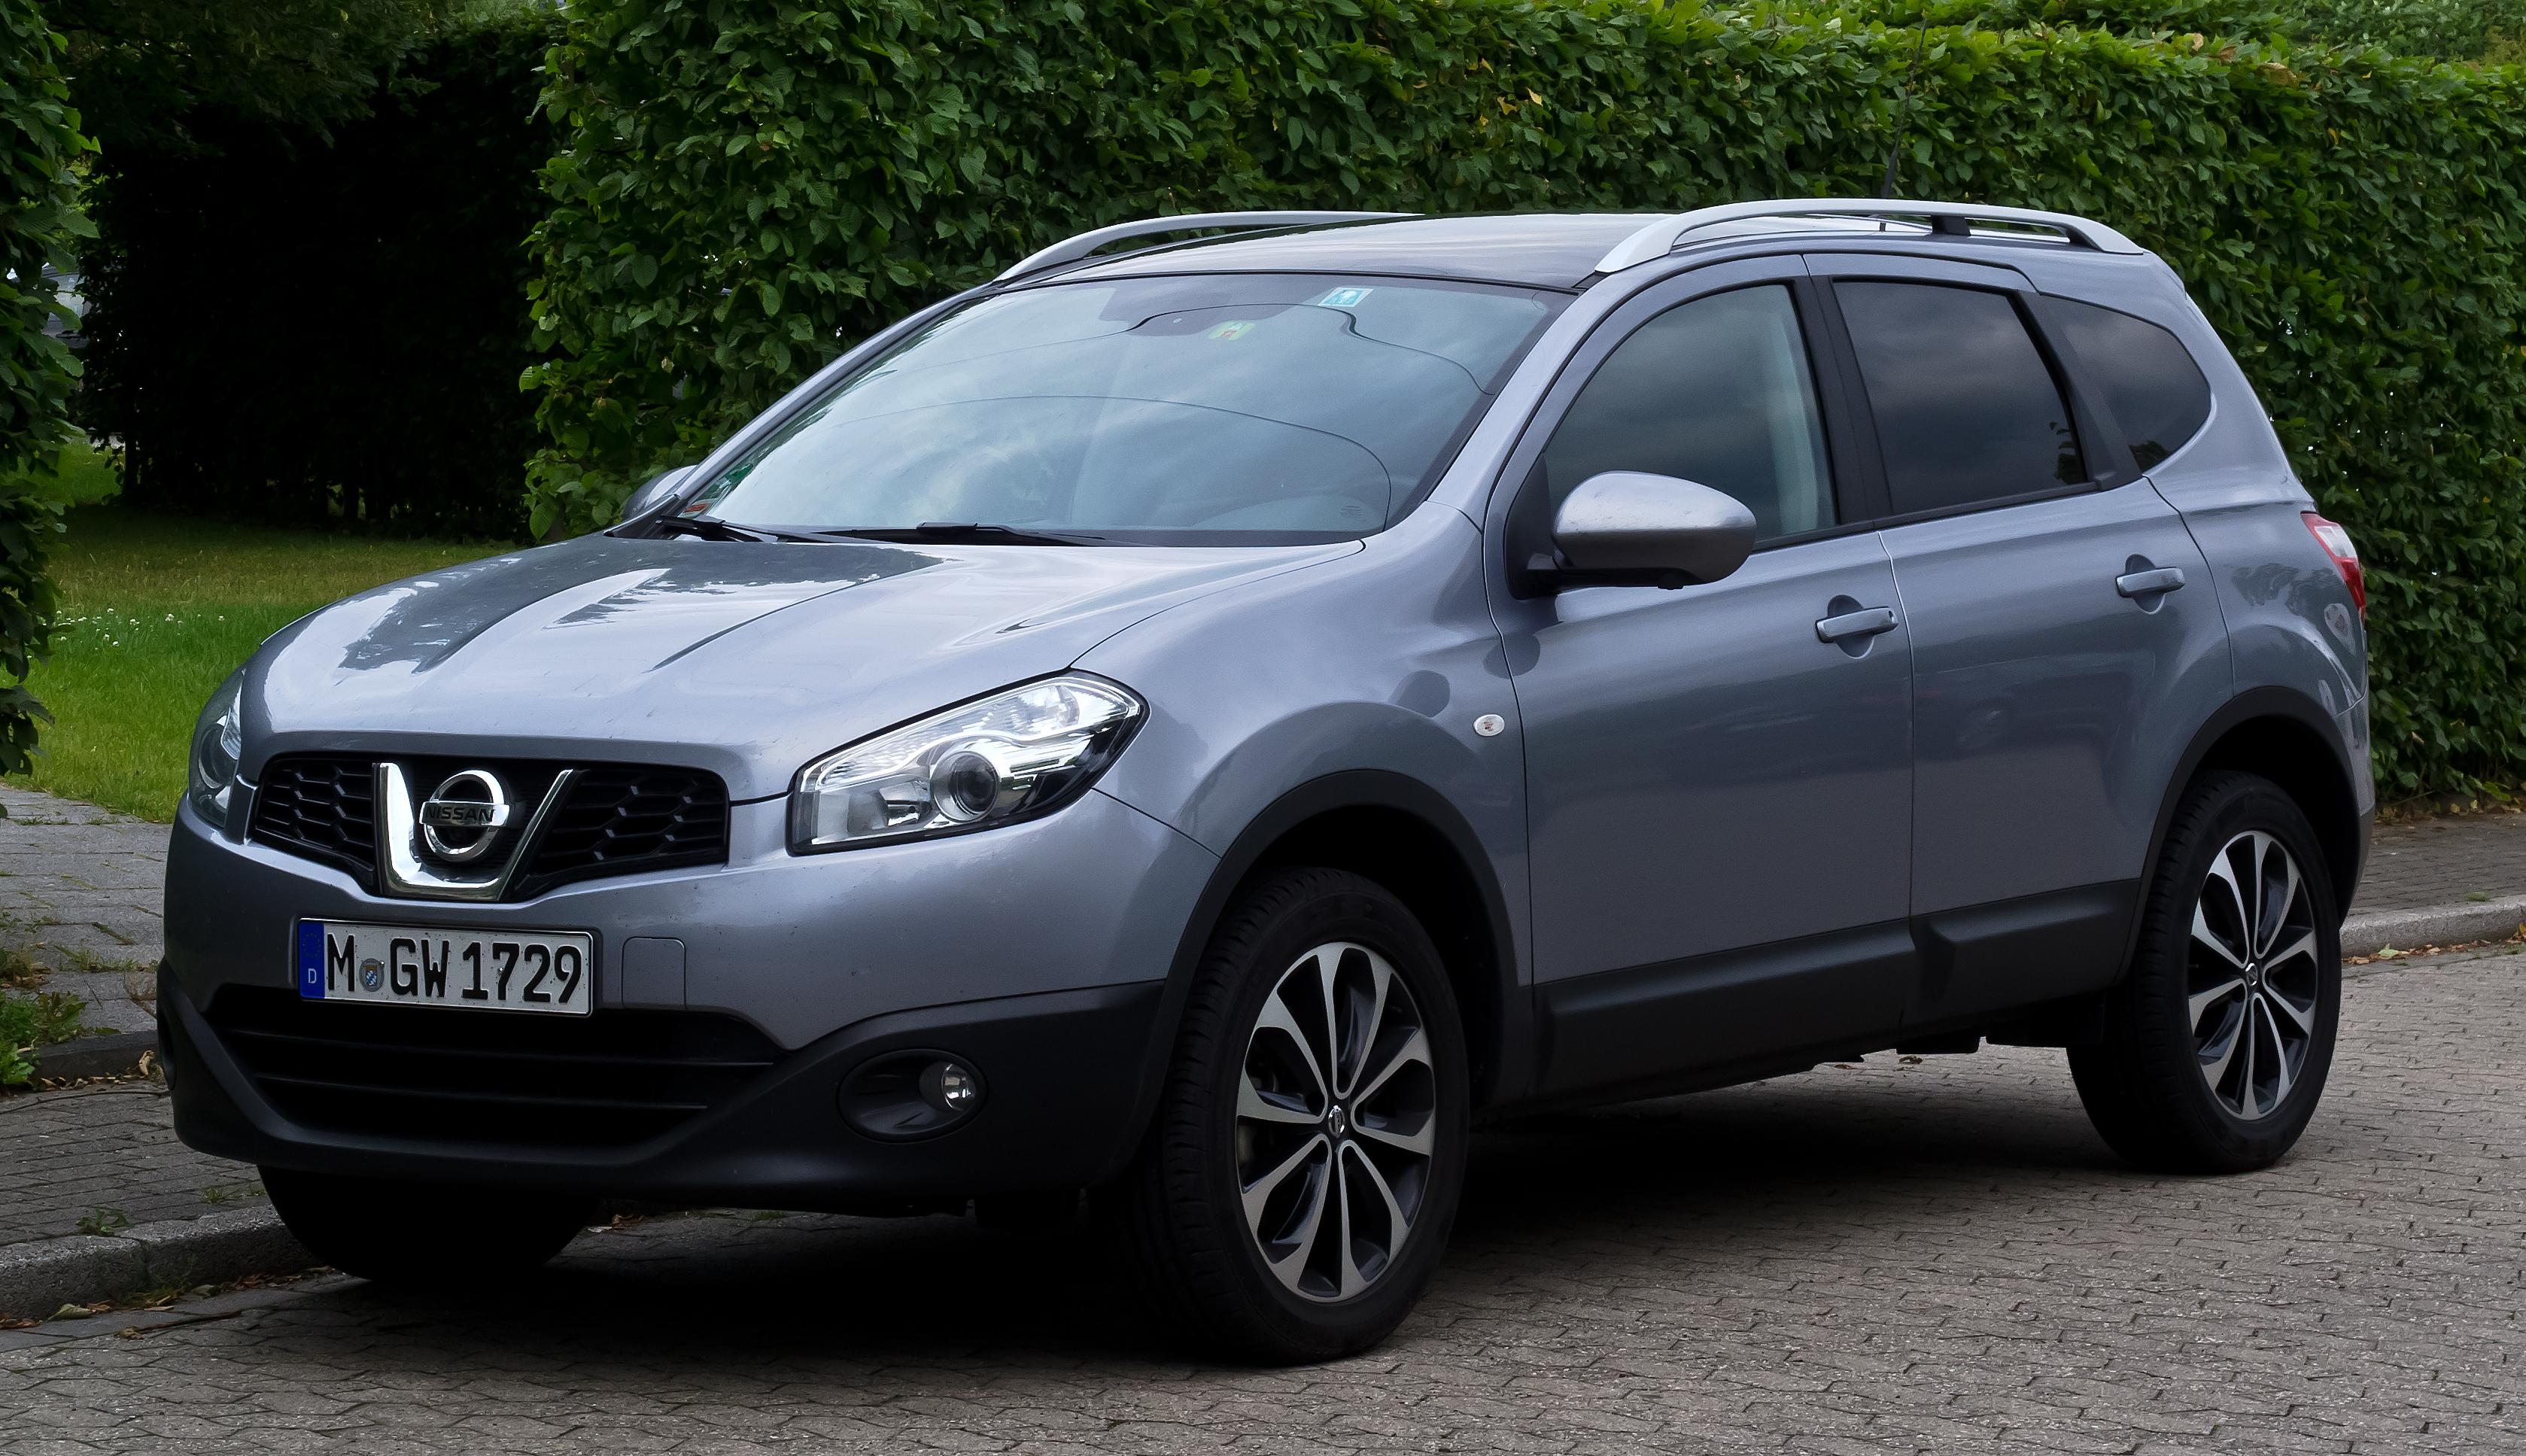 File:Nissan Qashqai+2 (Facelift) – Frontansicht, 8. Juli ...